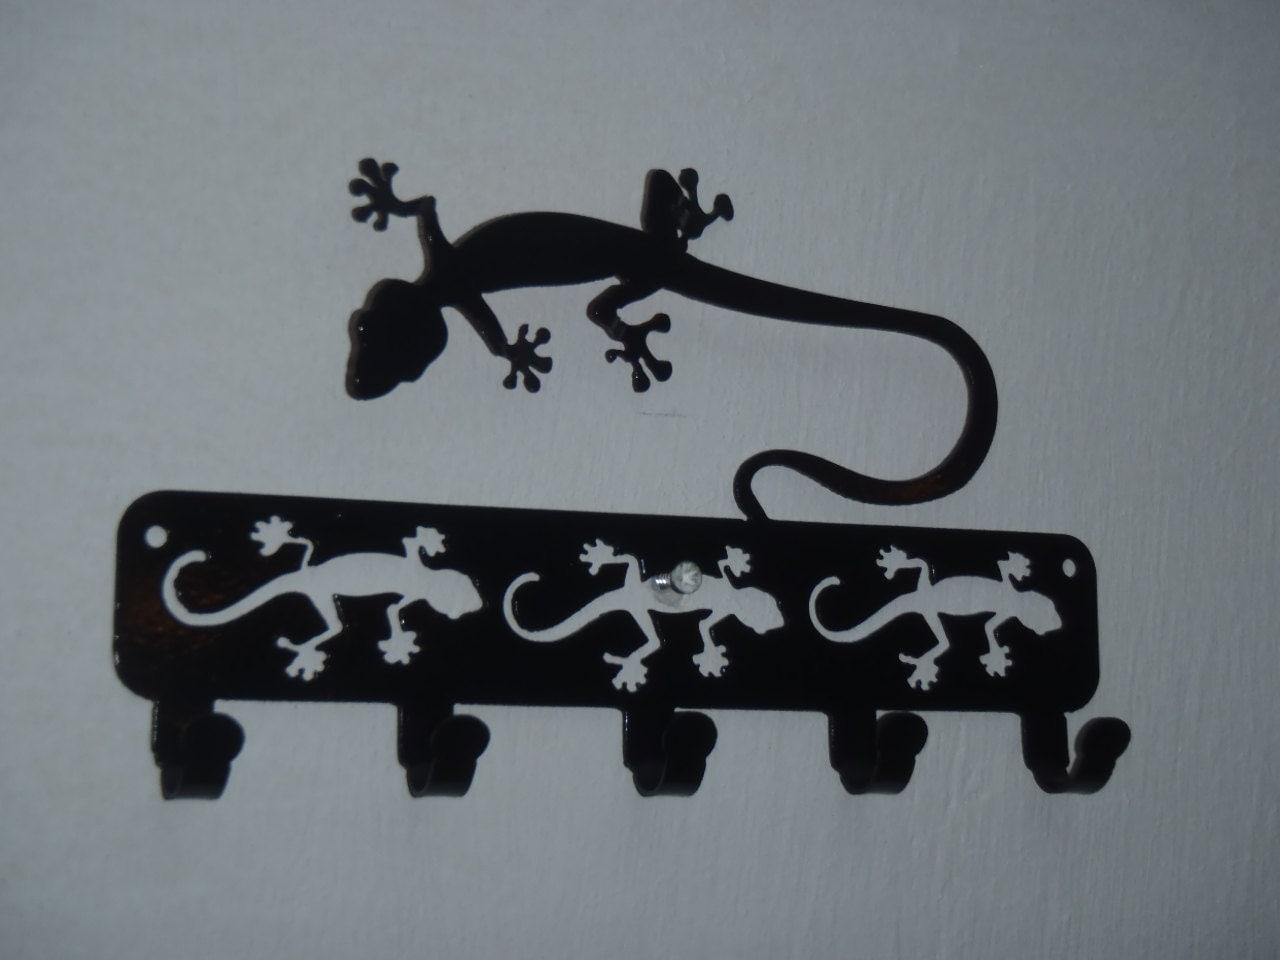 Wall Decor With Key Hooks : Gecko key rack wall decor metal art